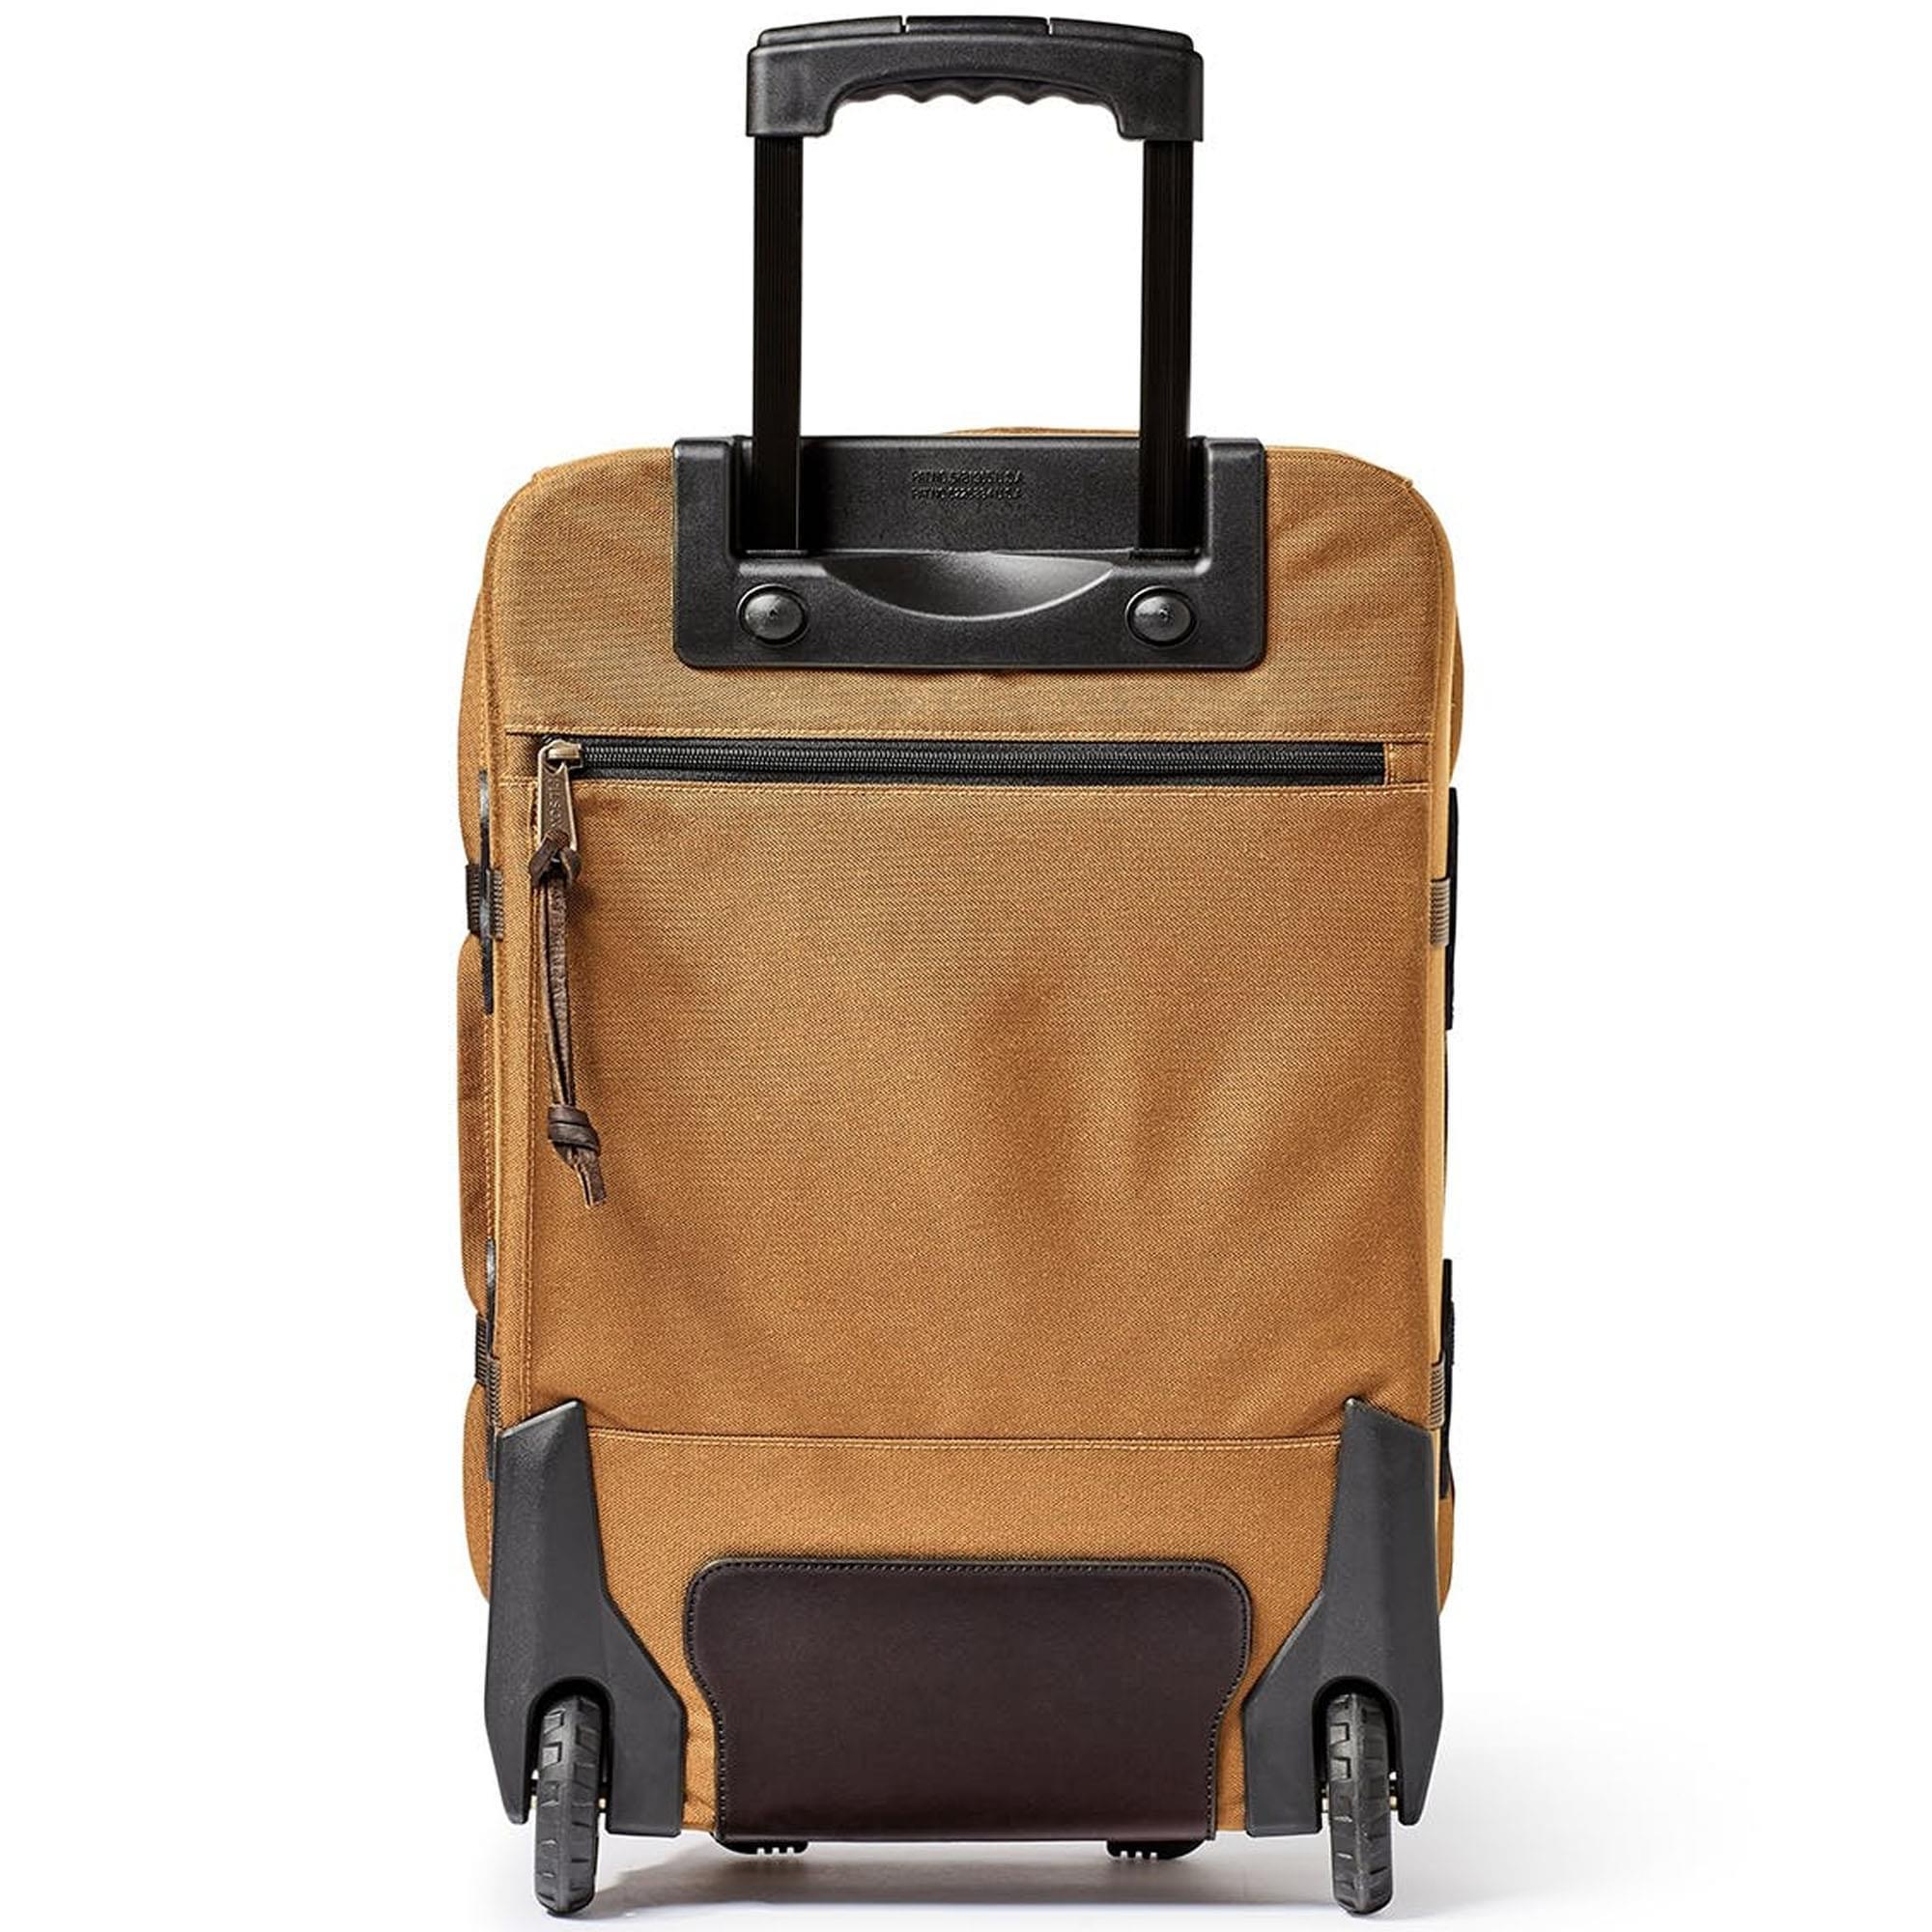 Filson - Multicolor Ballistic Nylon Dryden Rolling 2-wheel Carry-on Bag for  Men. View fullscreen be9132b3adf64